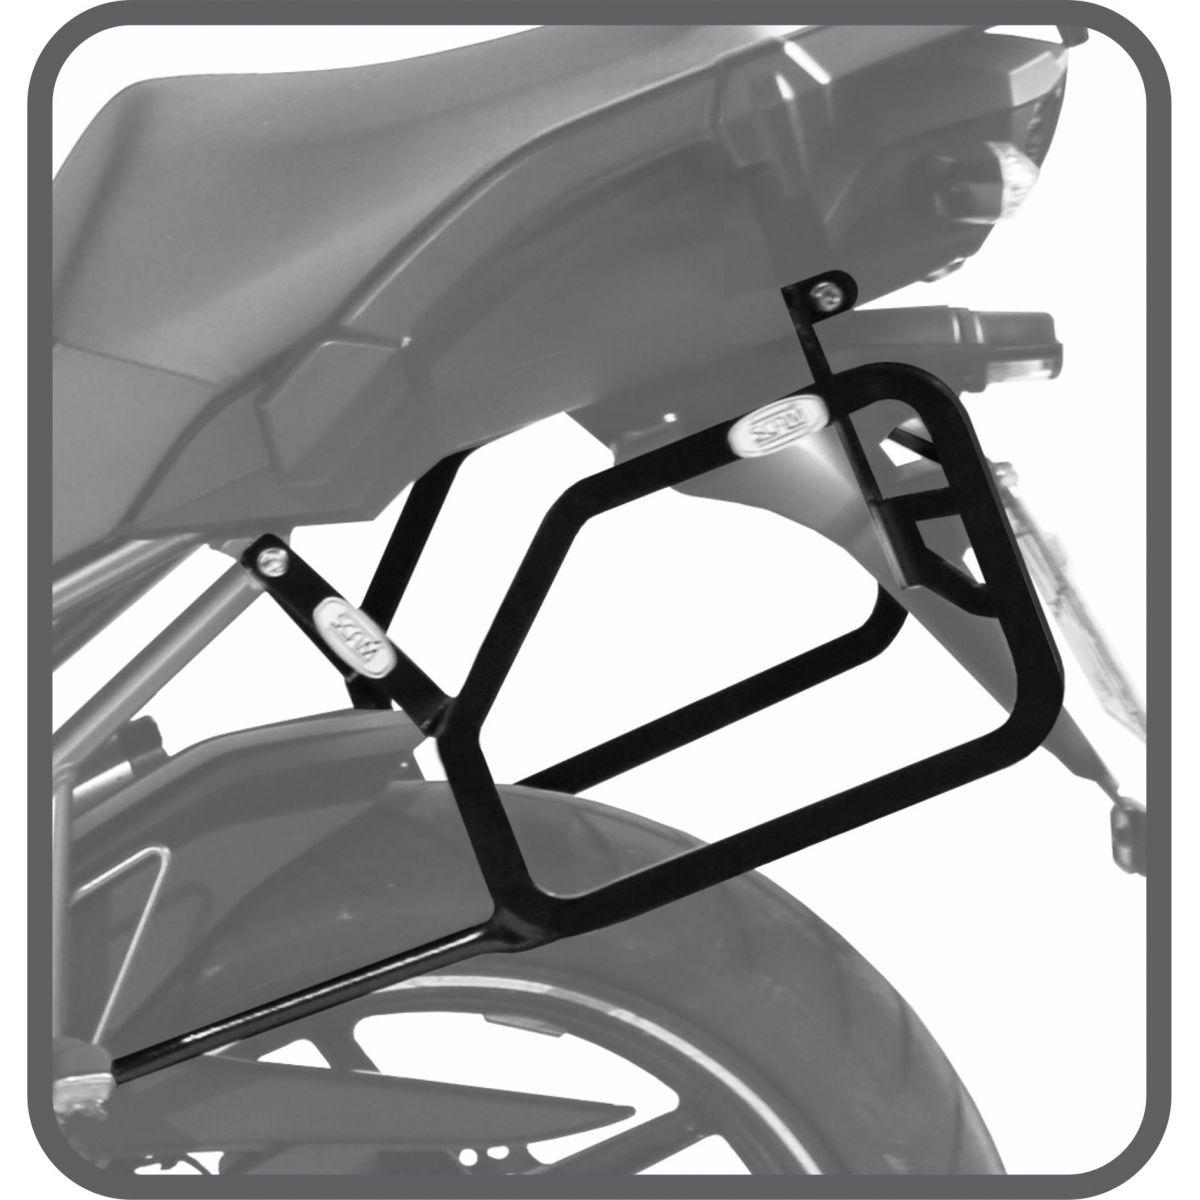 Afastador de Alforje para Kawasaki Versys 1000 até 2014 - Scam